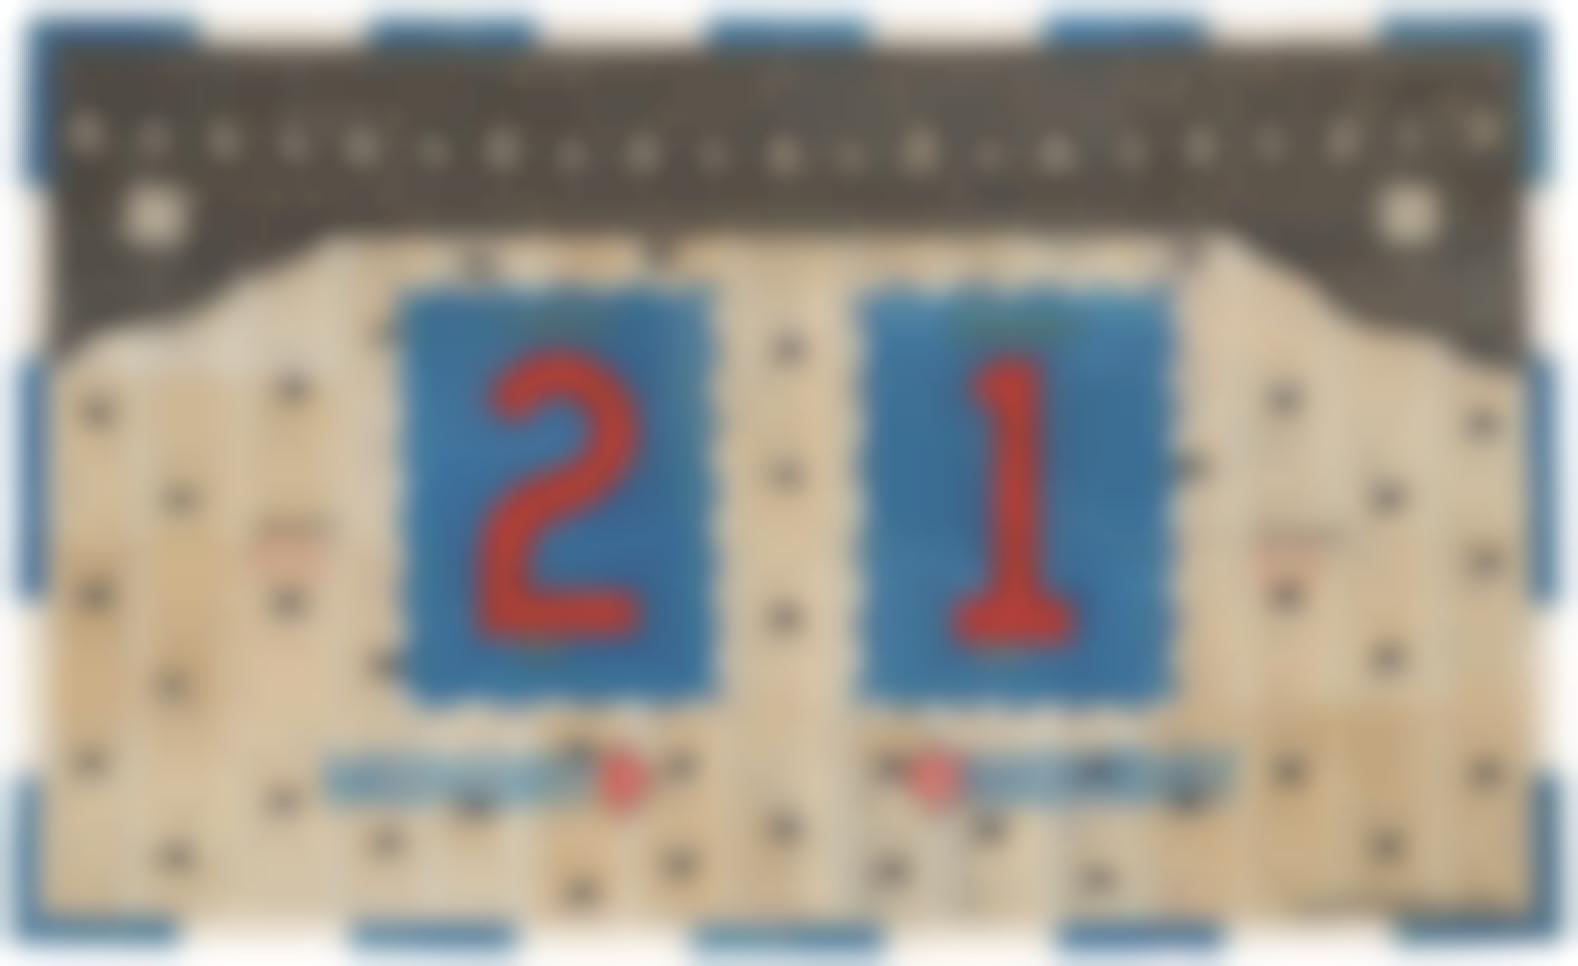 George Widener-2 And 1, Robot Teaching Calendar-2009